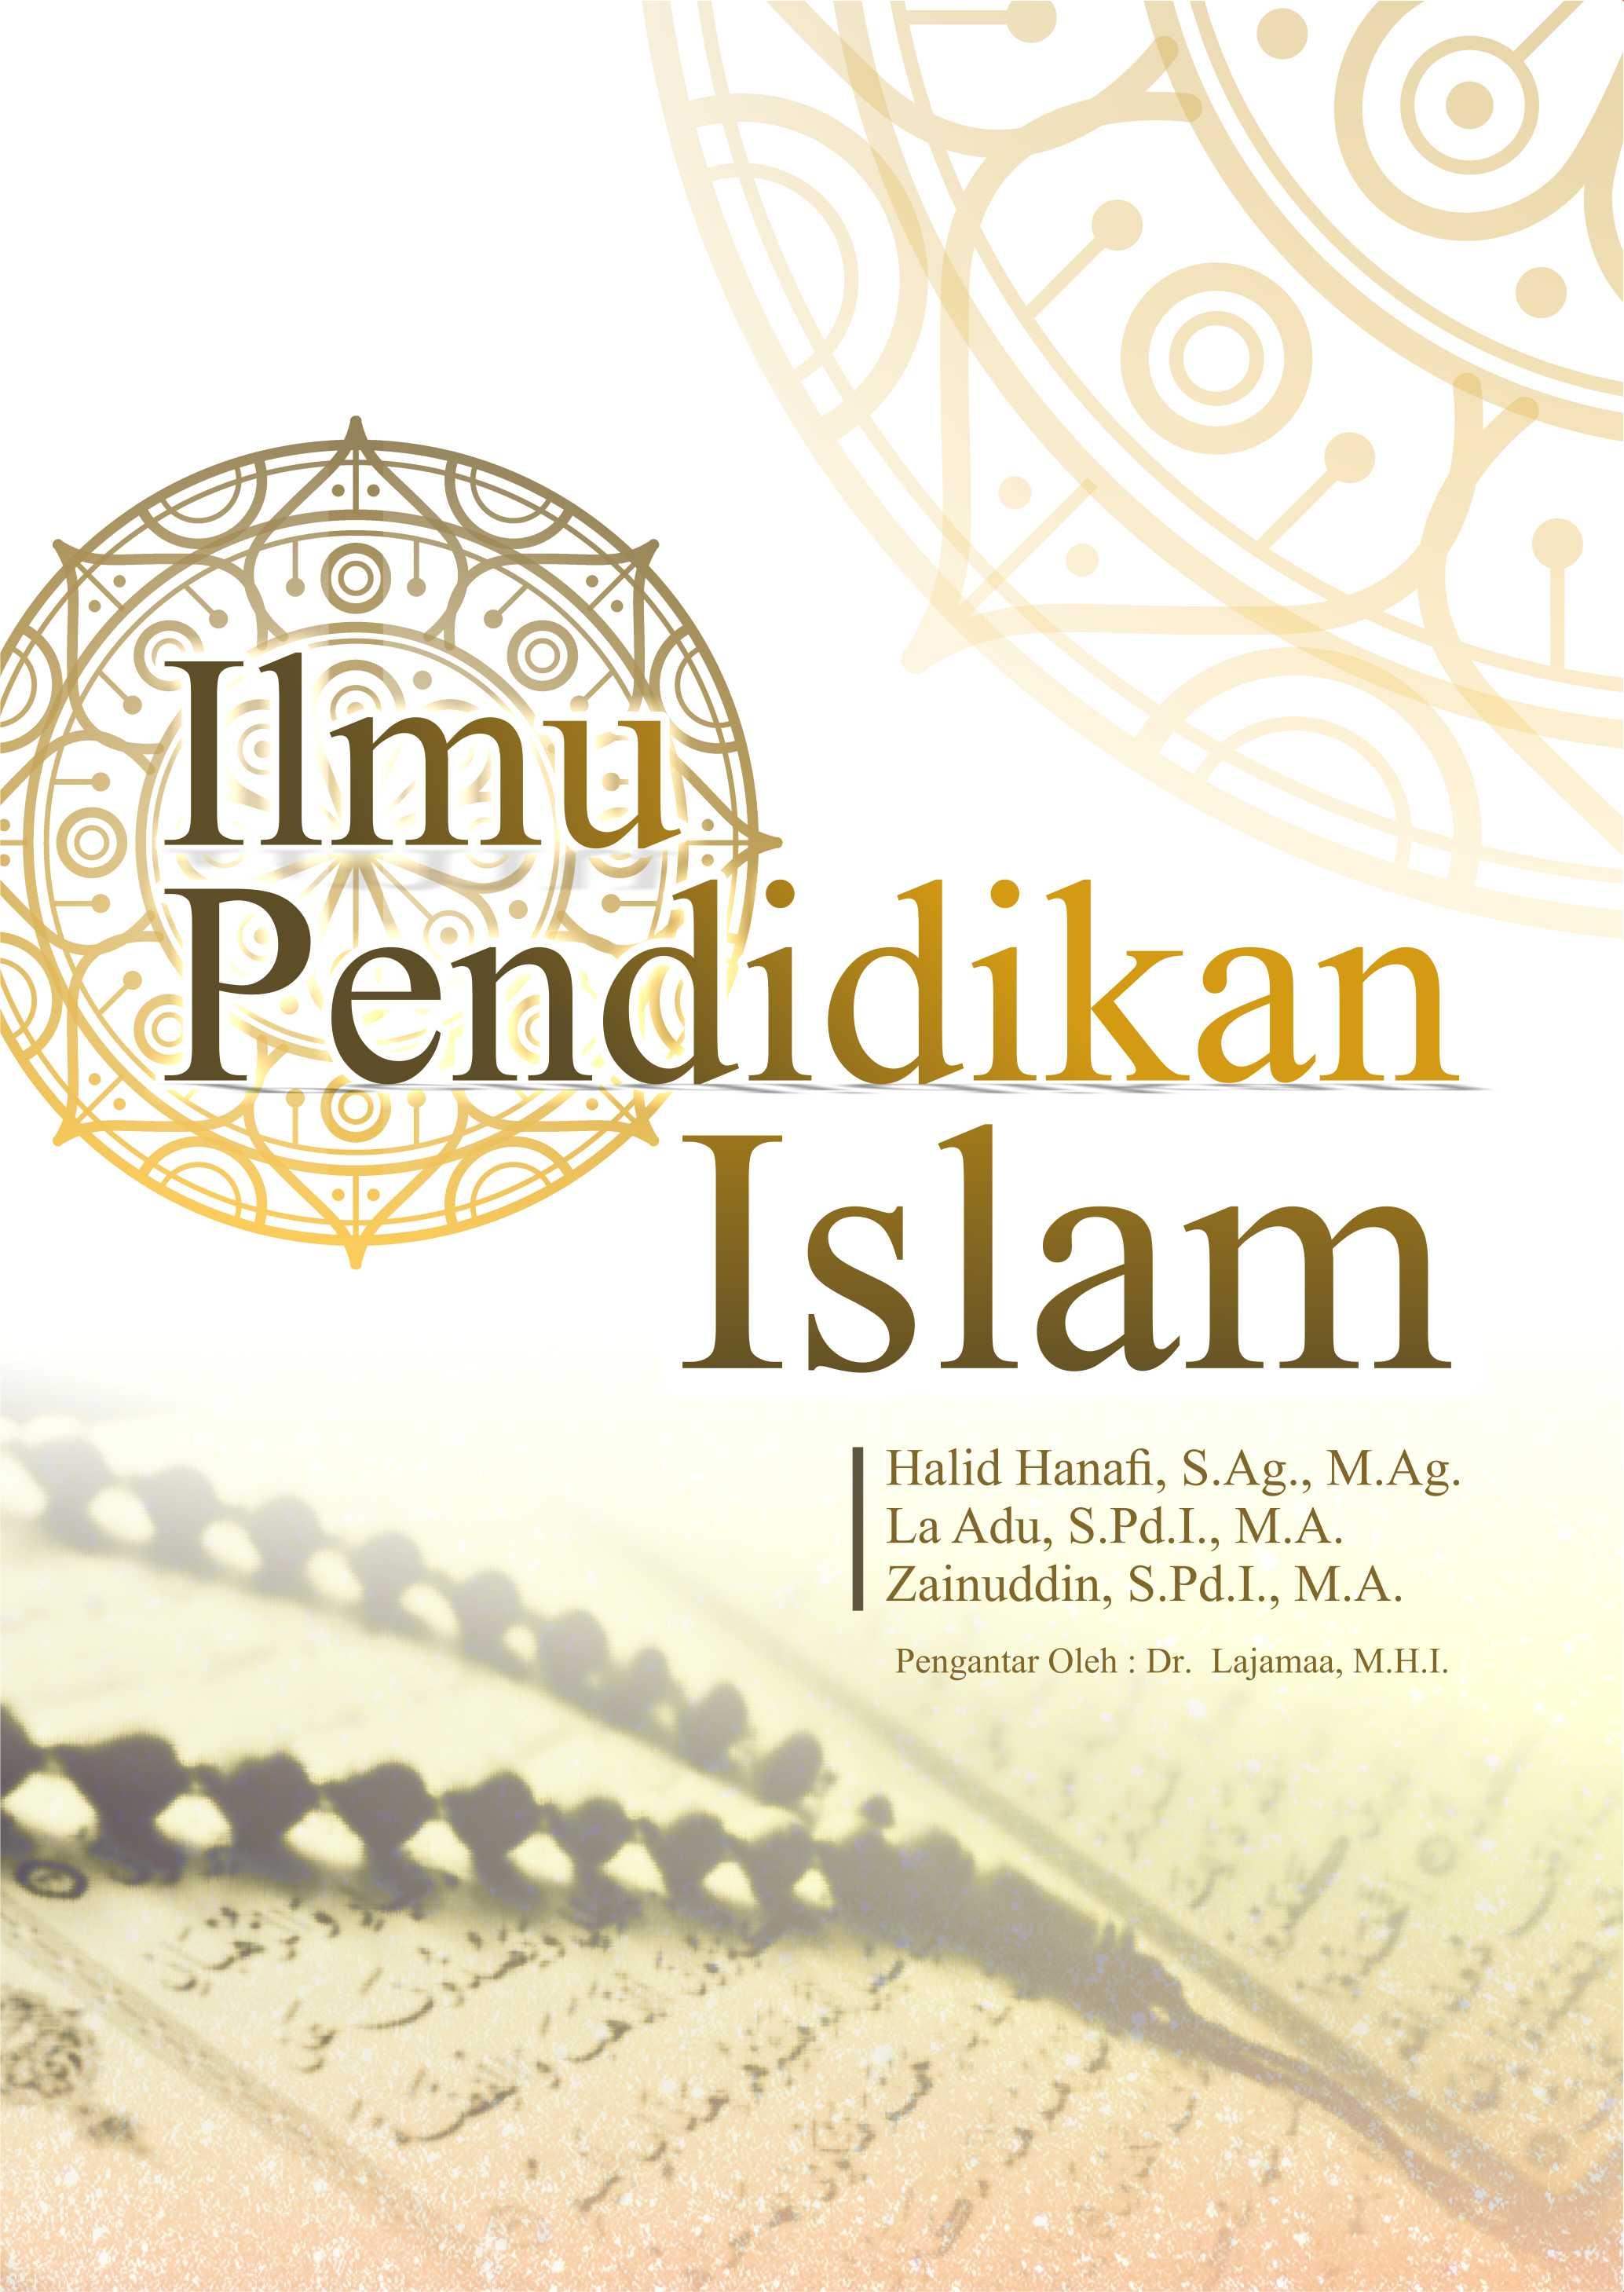 Ilmu pendidikan Islam [sumber elektronis]